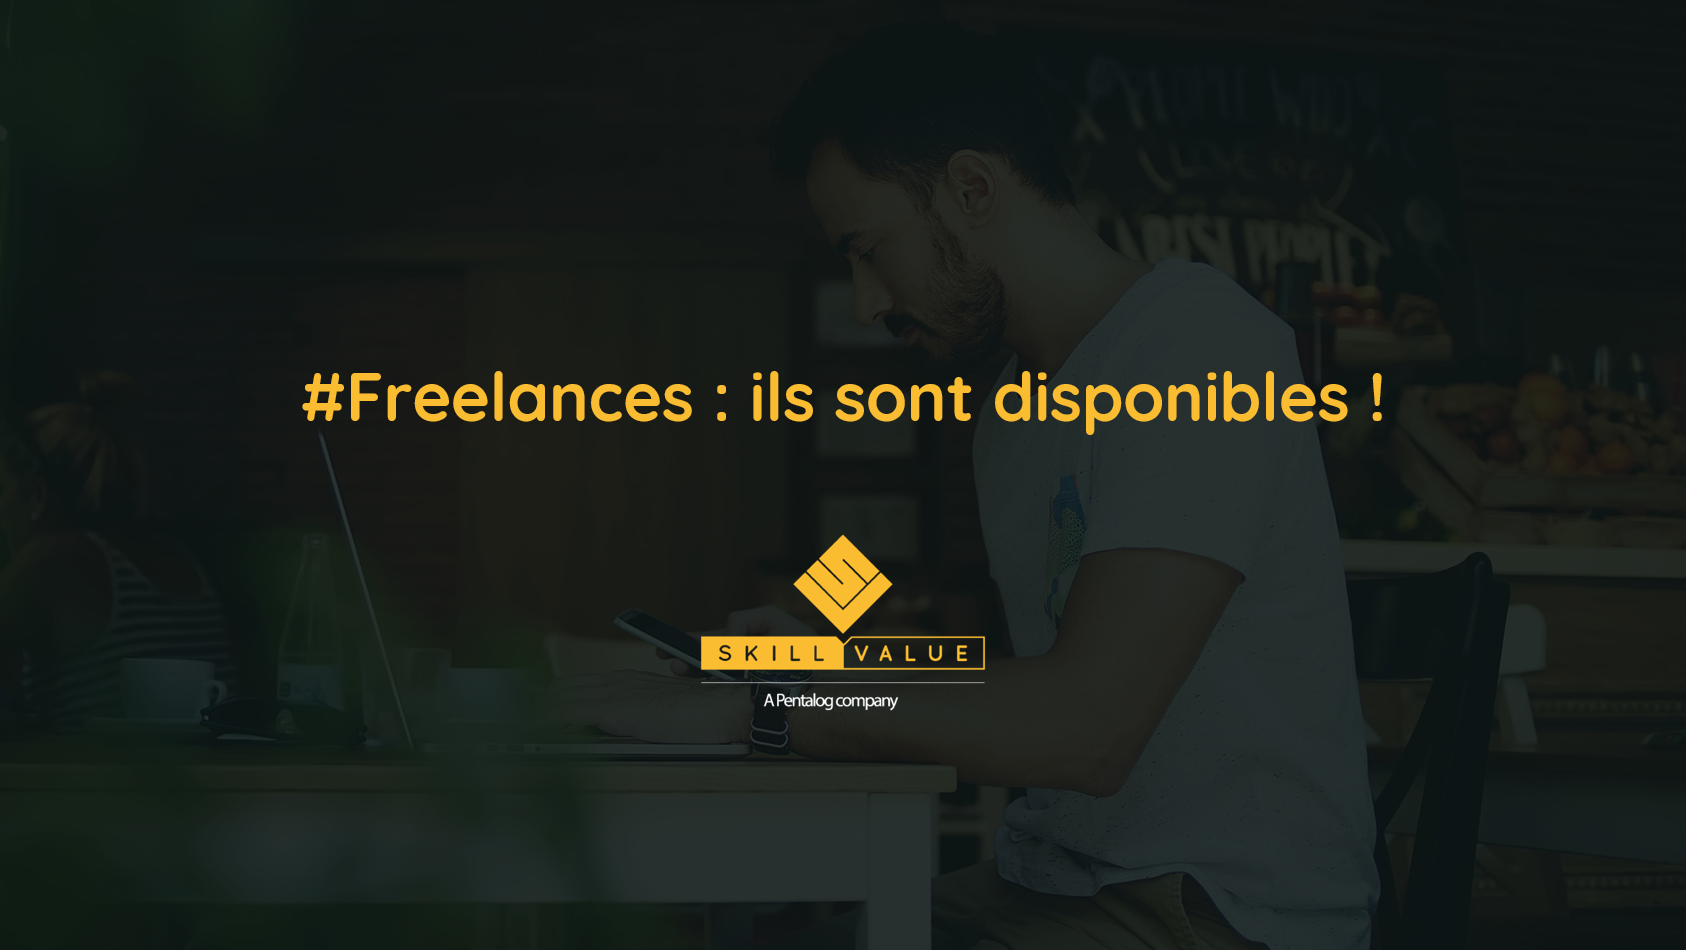 developpeurs_freelances_disponibles_skillvalue